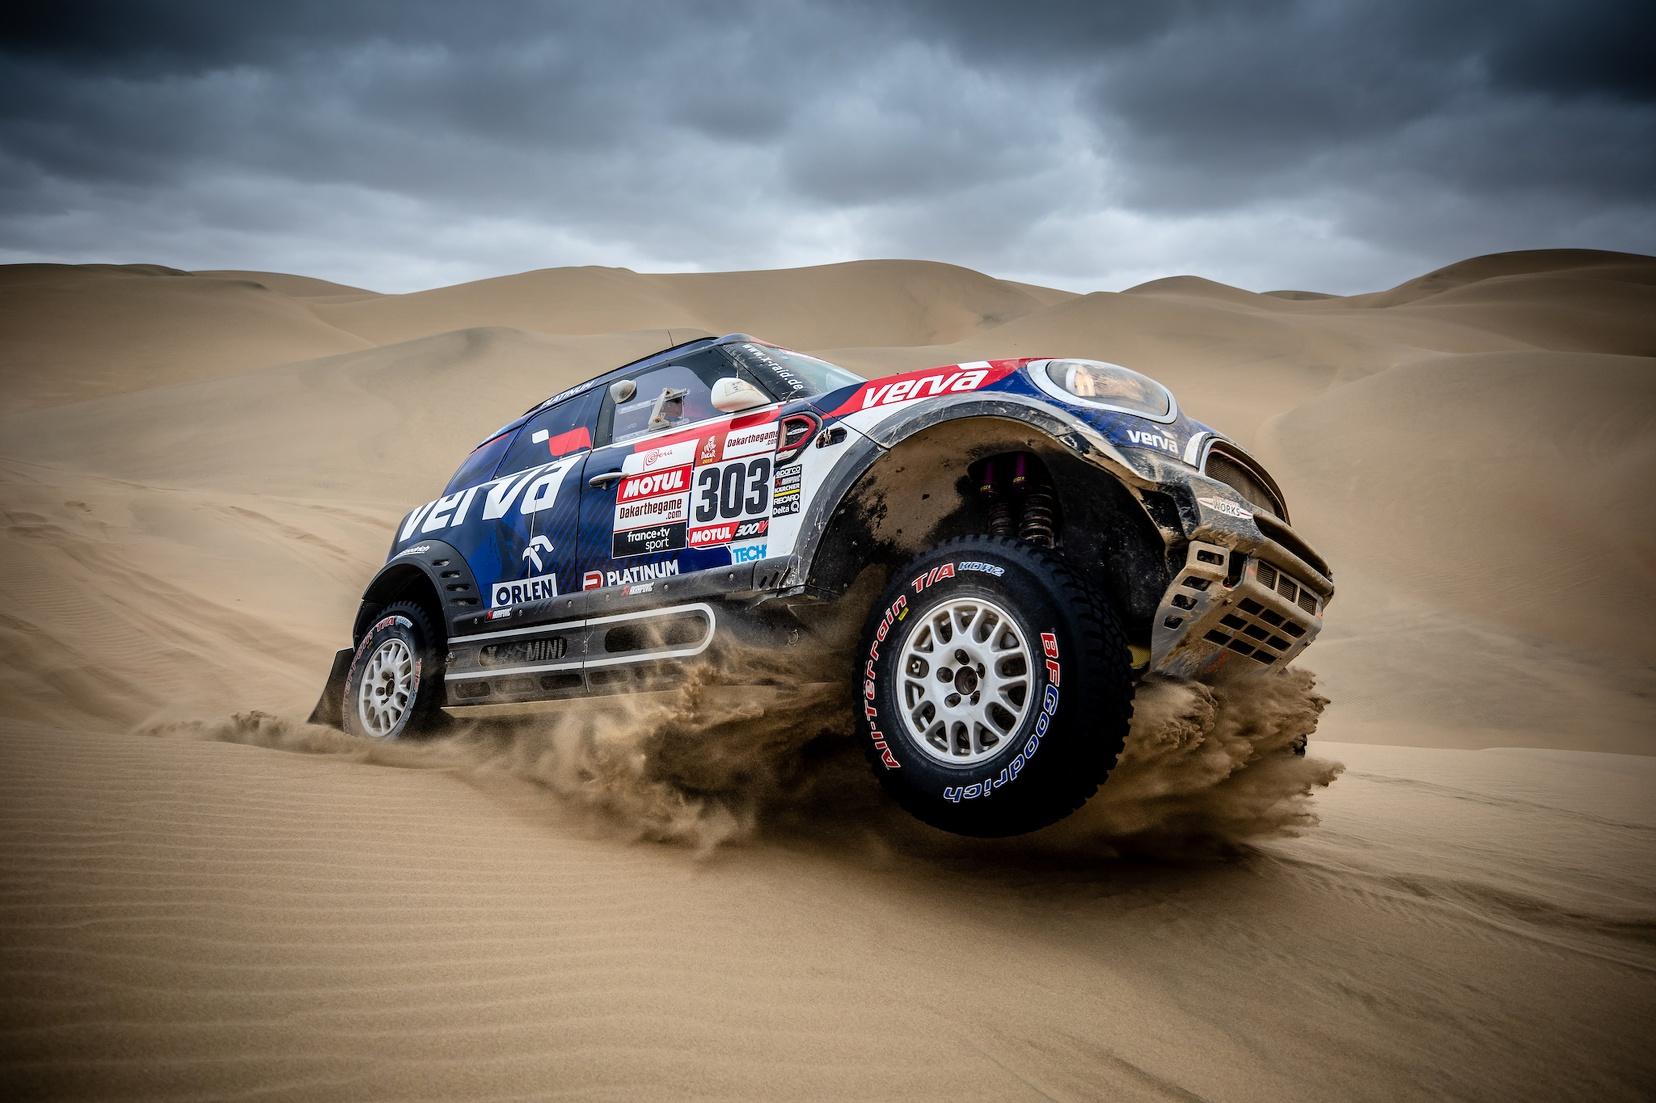 MINI to Tackle 2020 Dakar Rally with nine cars in Saudi Arabia